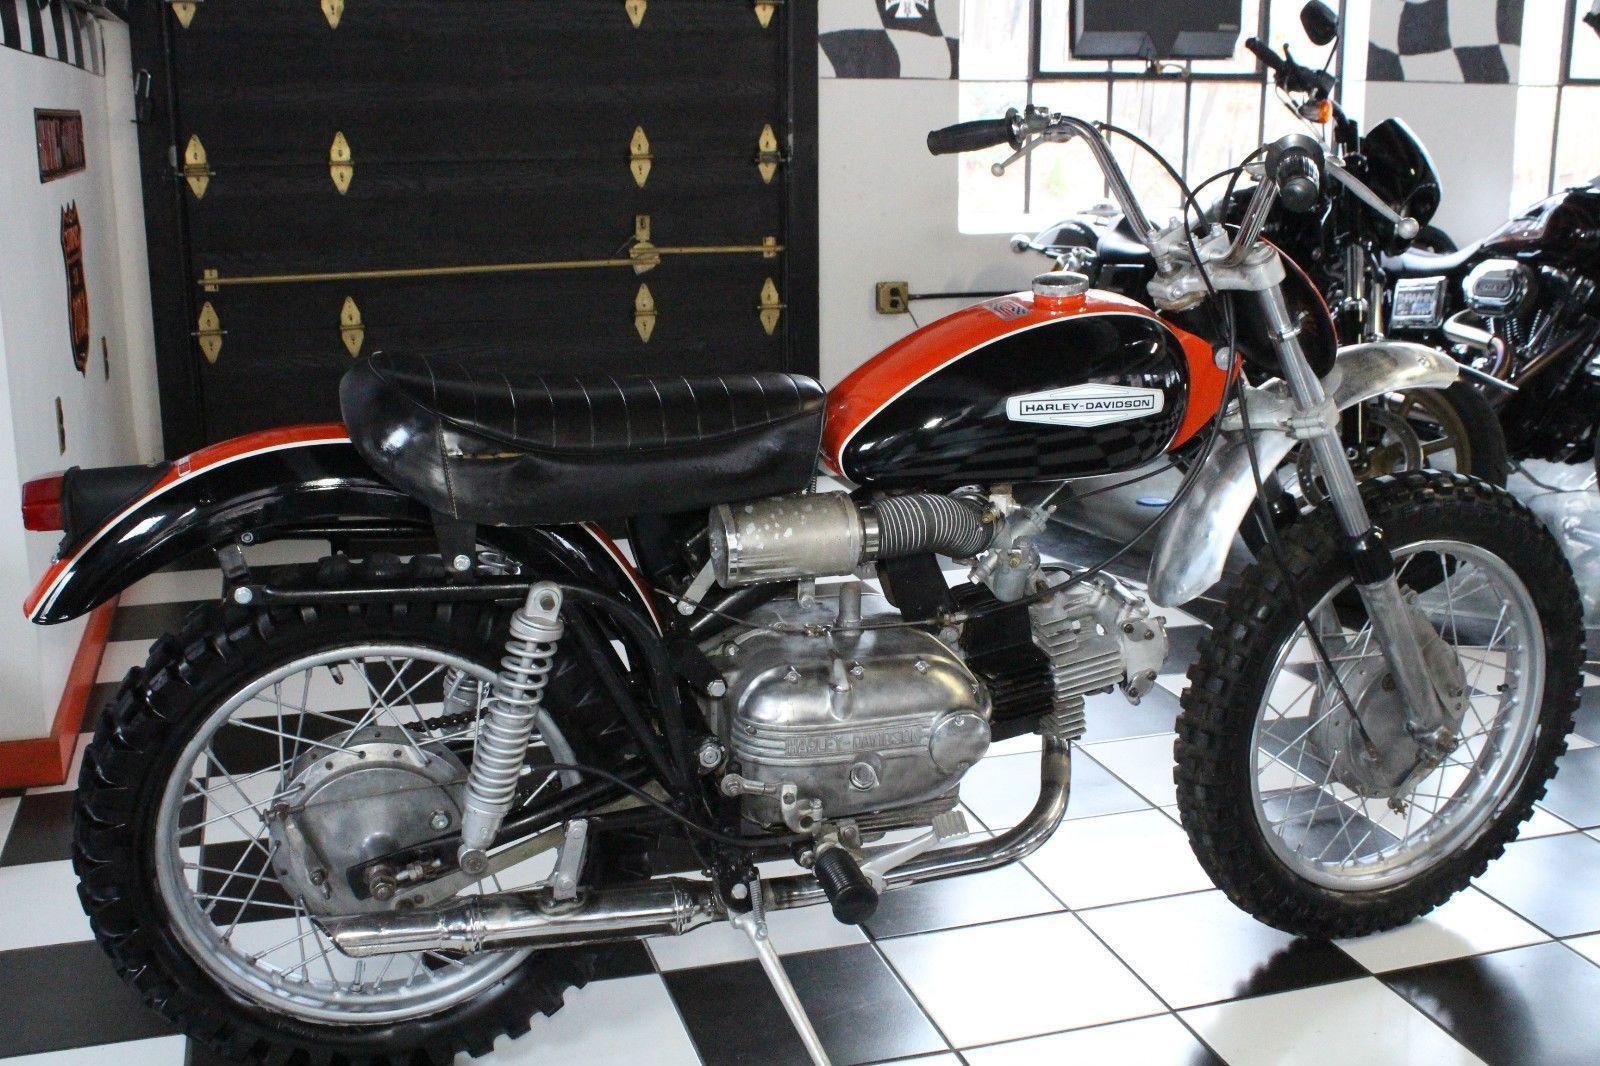 1966 Harley Davidson Sx 250 Aermacchi Mx Racer Harley Harley Dirt Bike Harley Davidson Motorcycles